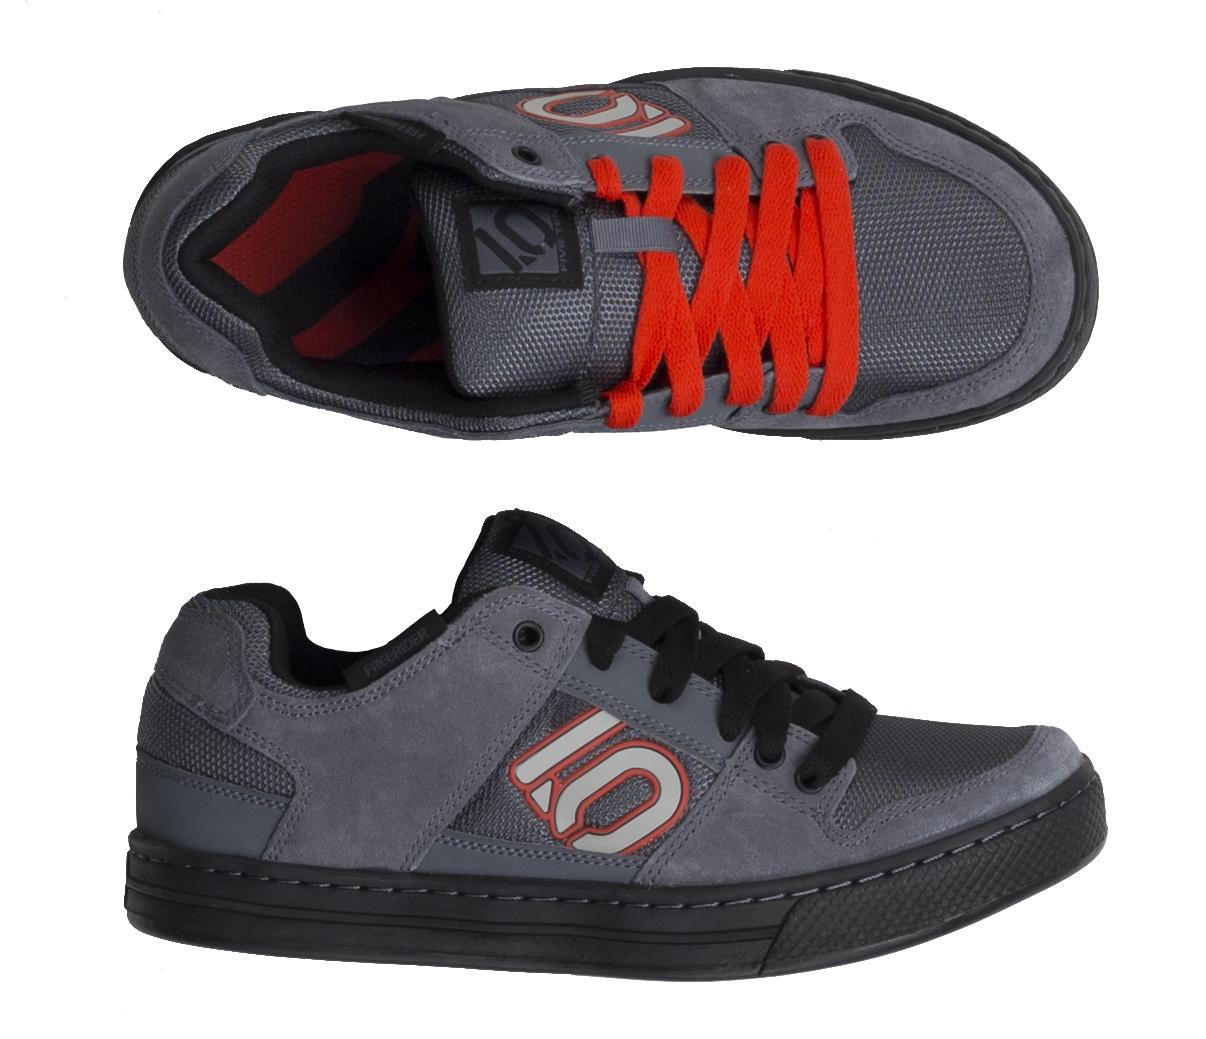 a1a961180c9 Five Ten Freerider MTB Shoes